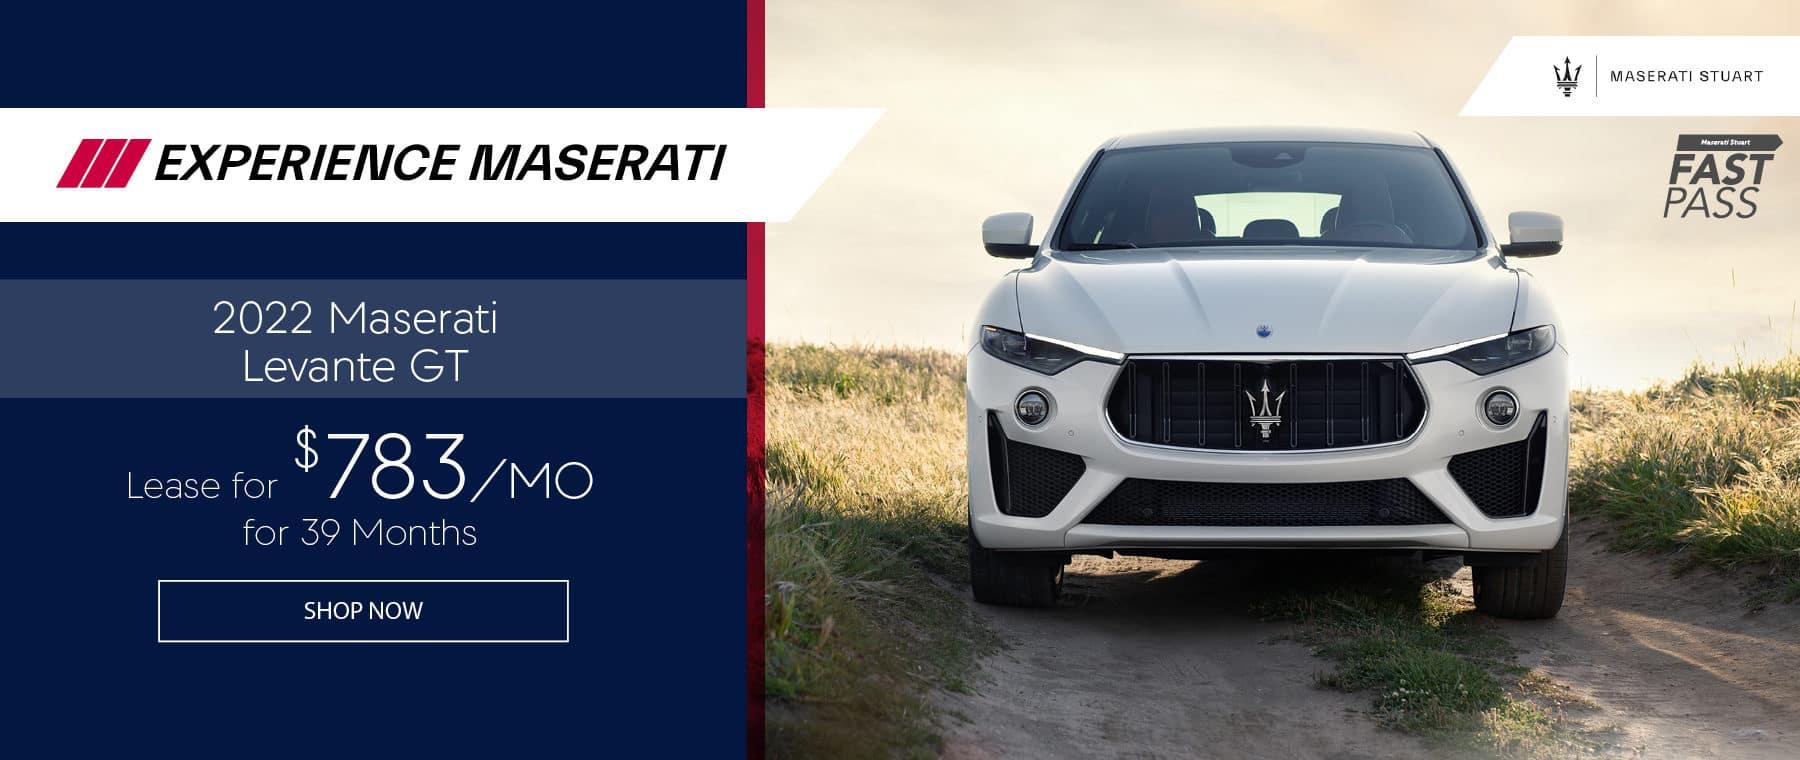 MaseratiStuart_ExperinceMaserati_WB_sept21 offers